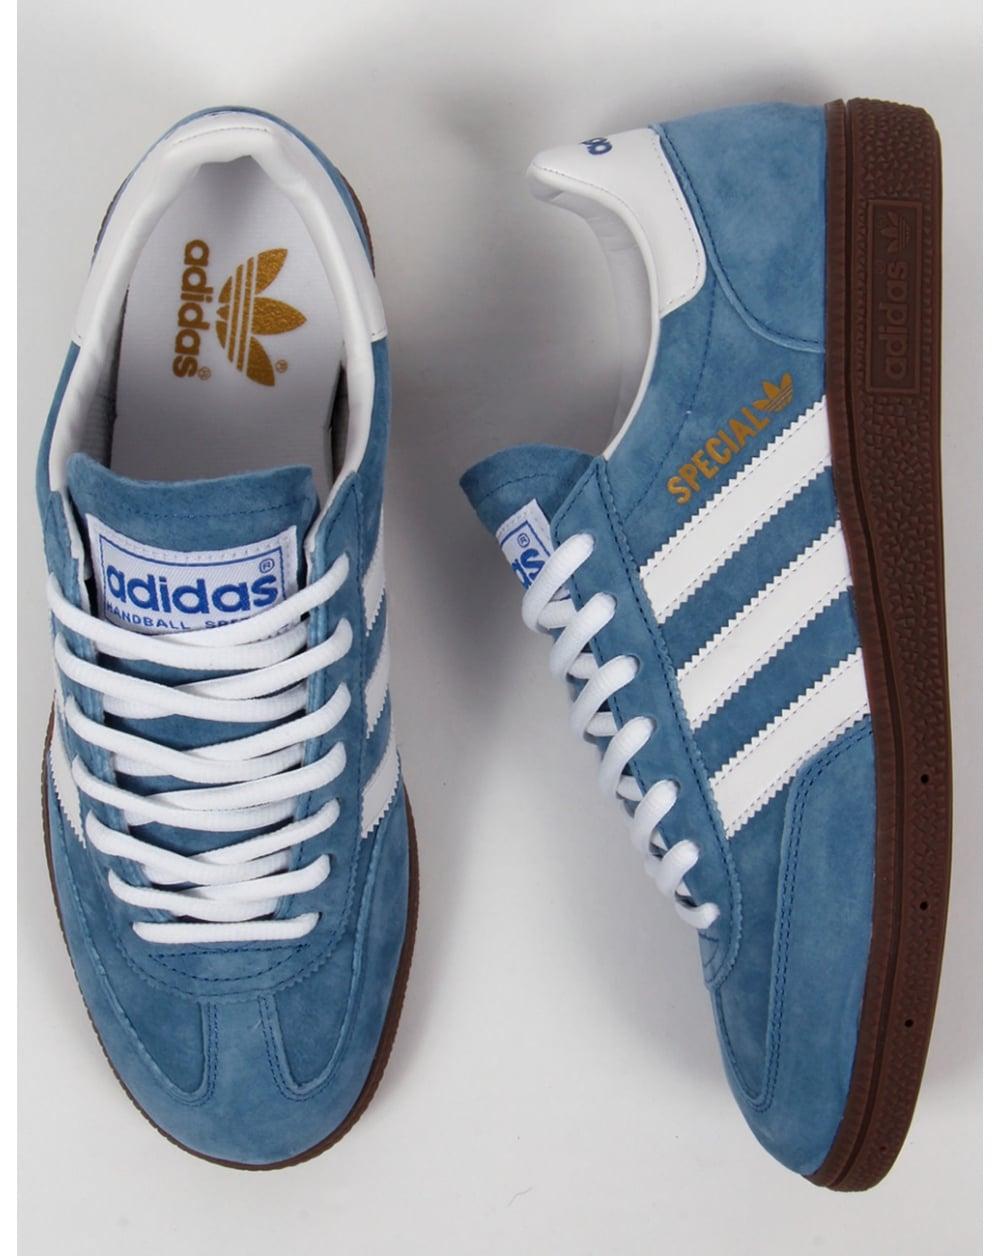 Royal blue prada shoes